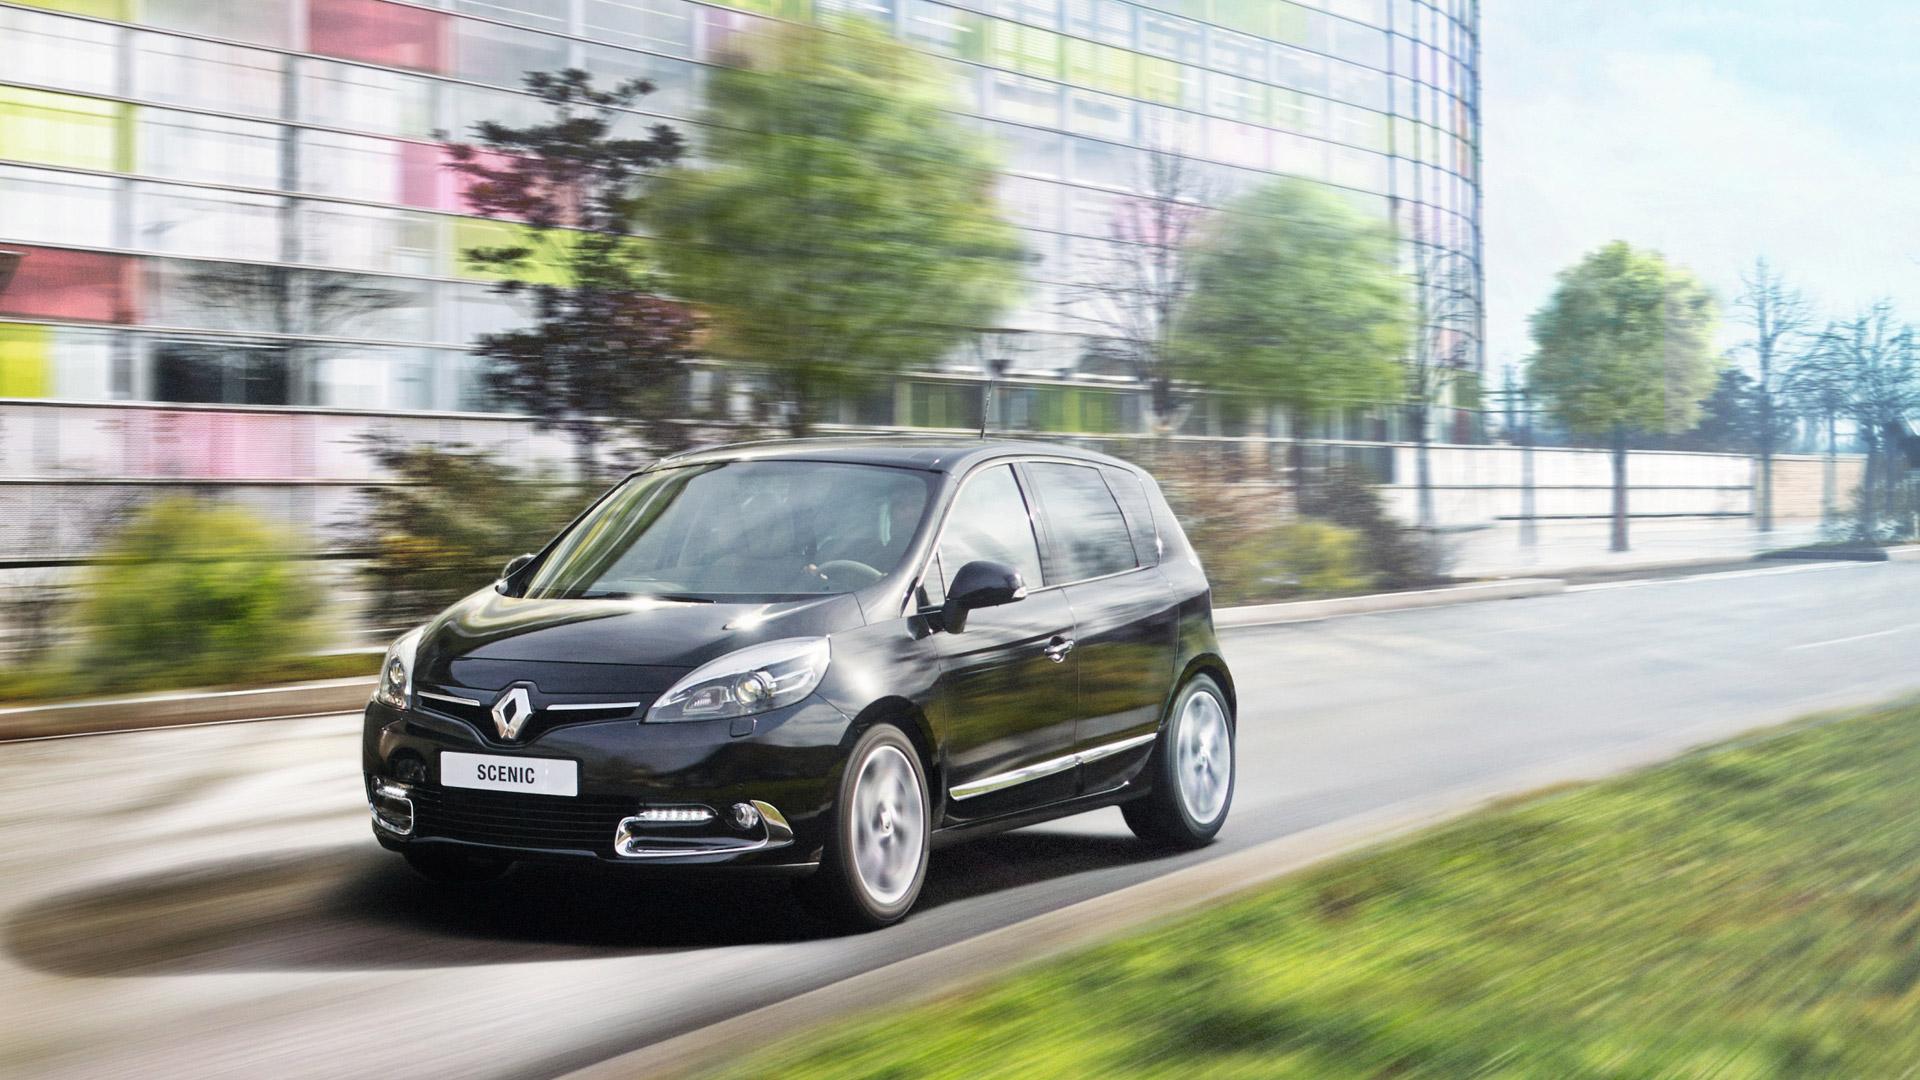 renault wallpaper (Renault Scenic)